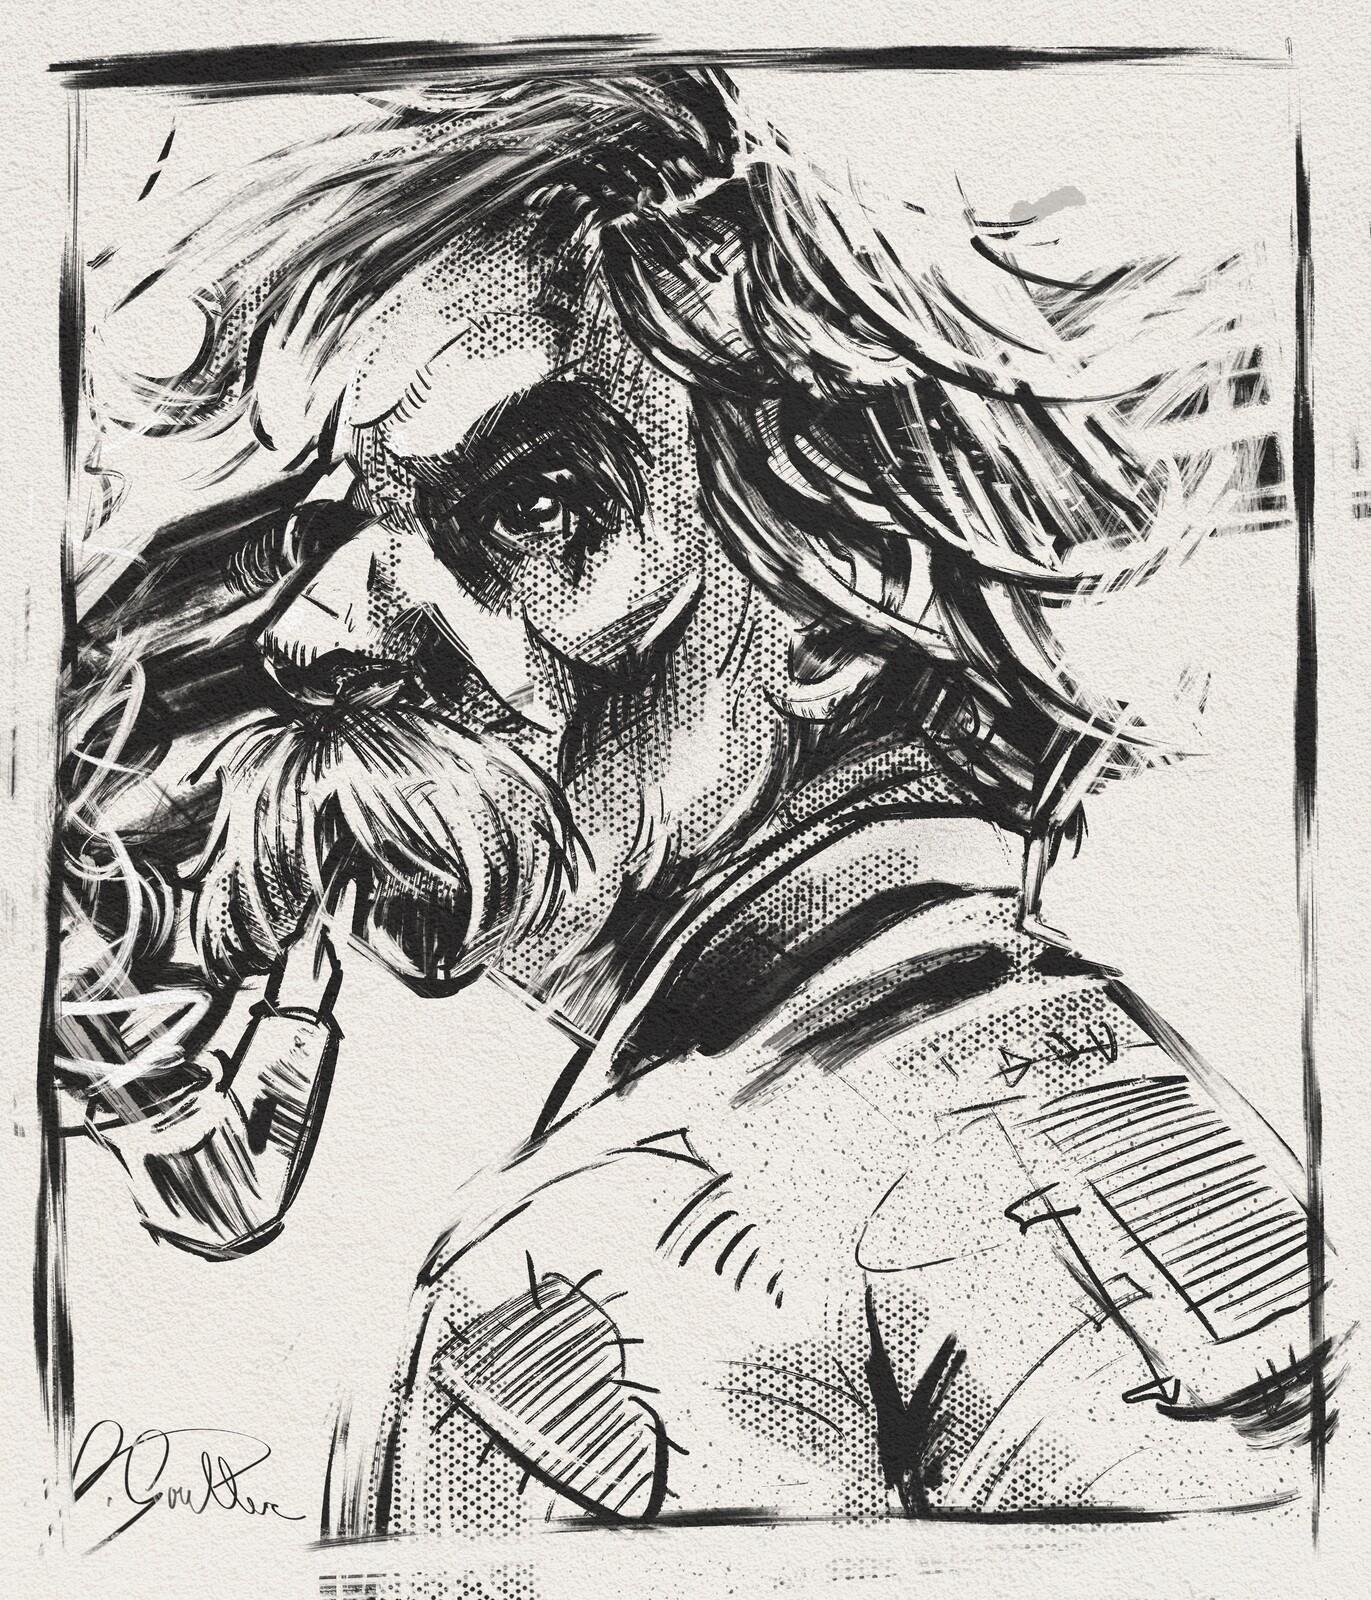 Thom ink